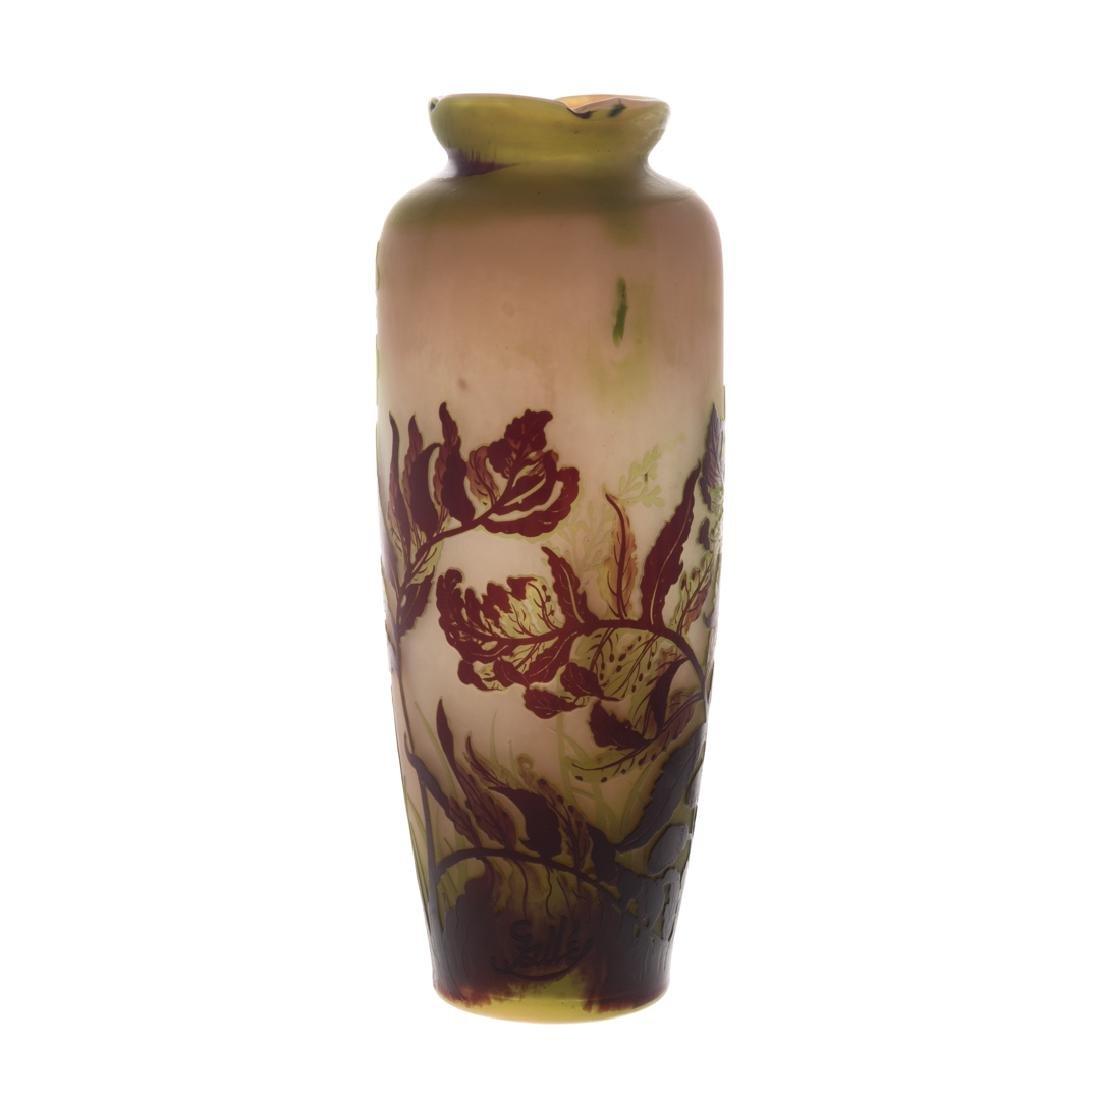 Emile Galle acid etched cameo glass vase - 3